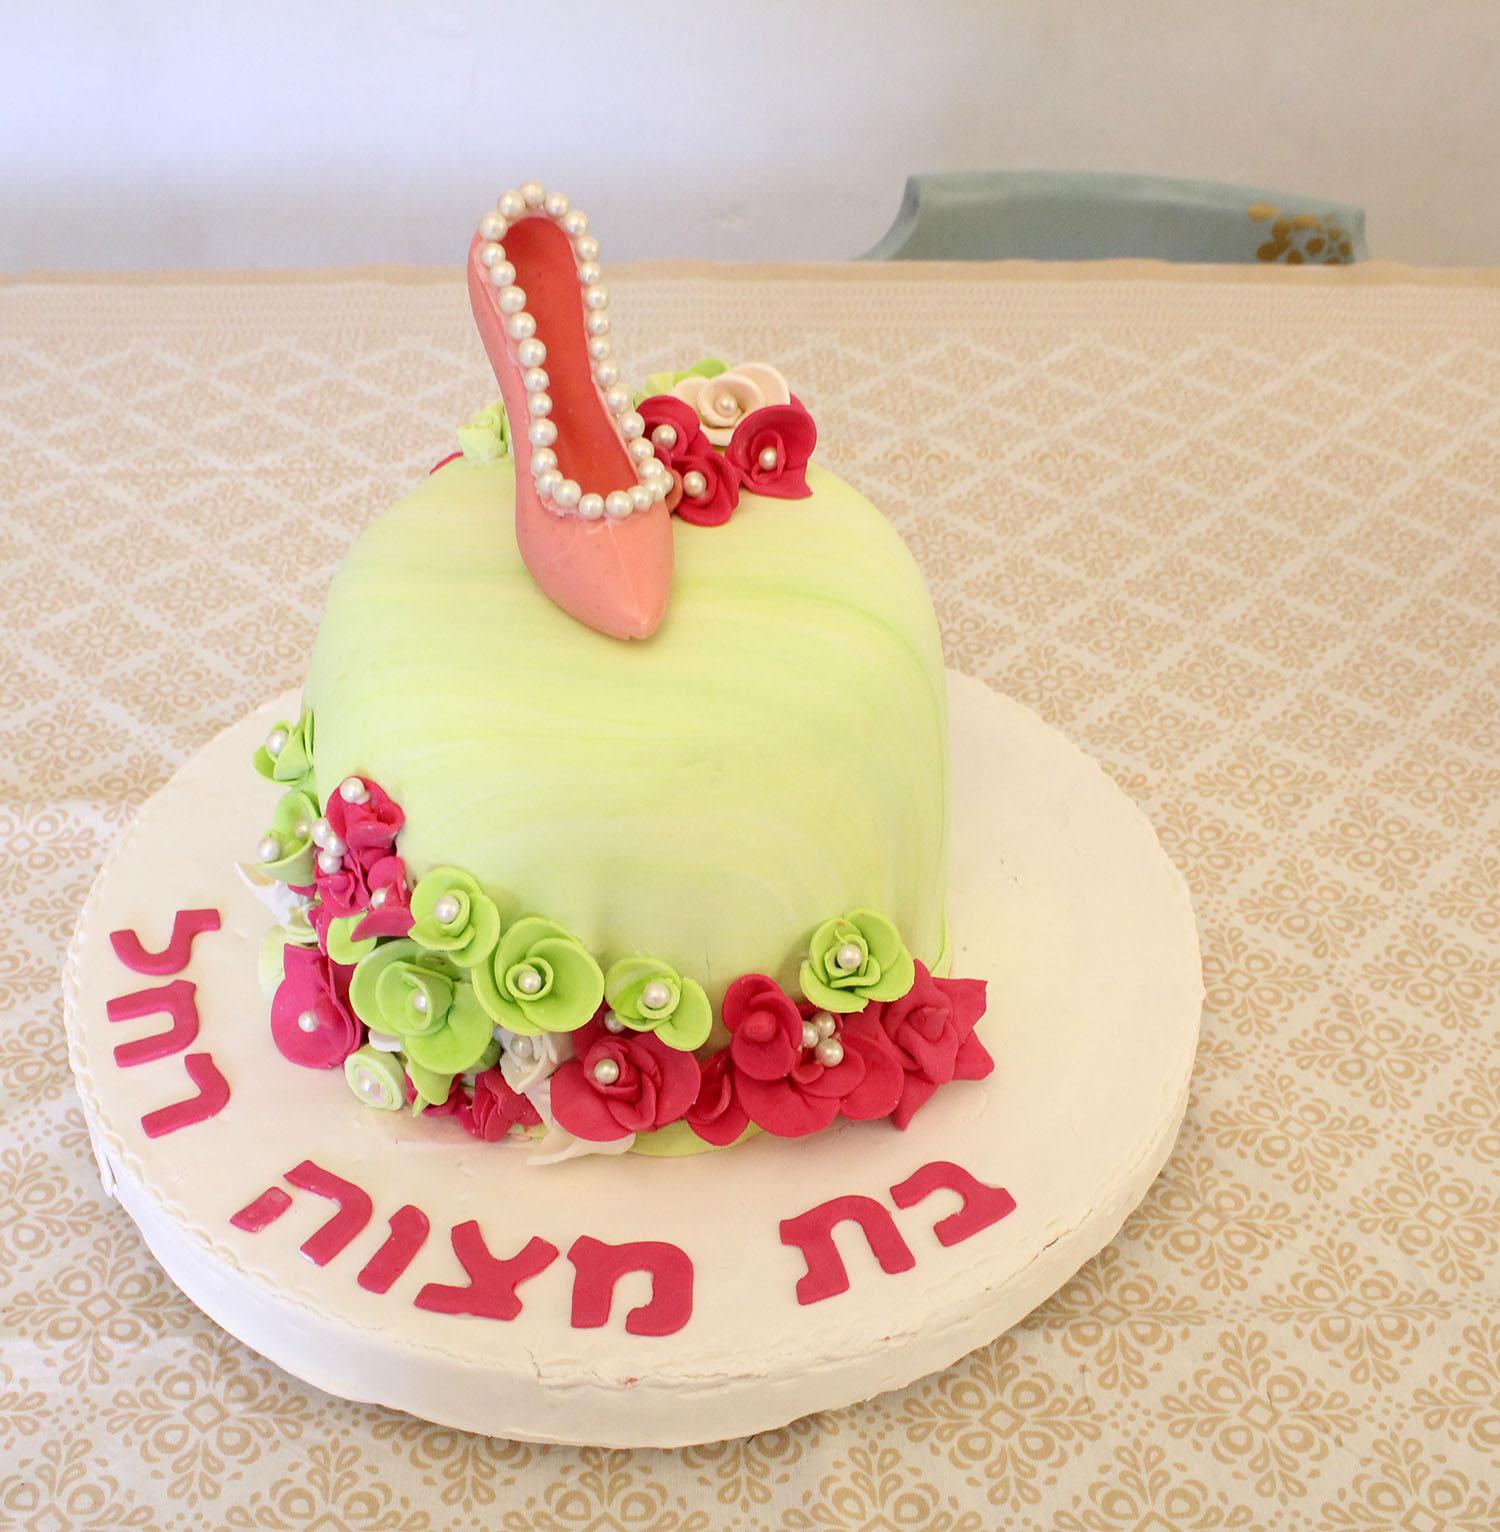 IMG 6339 - עוגה לבת מצוה